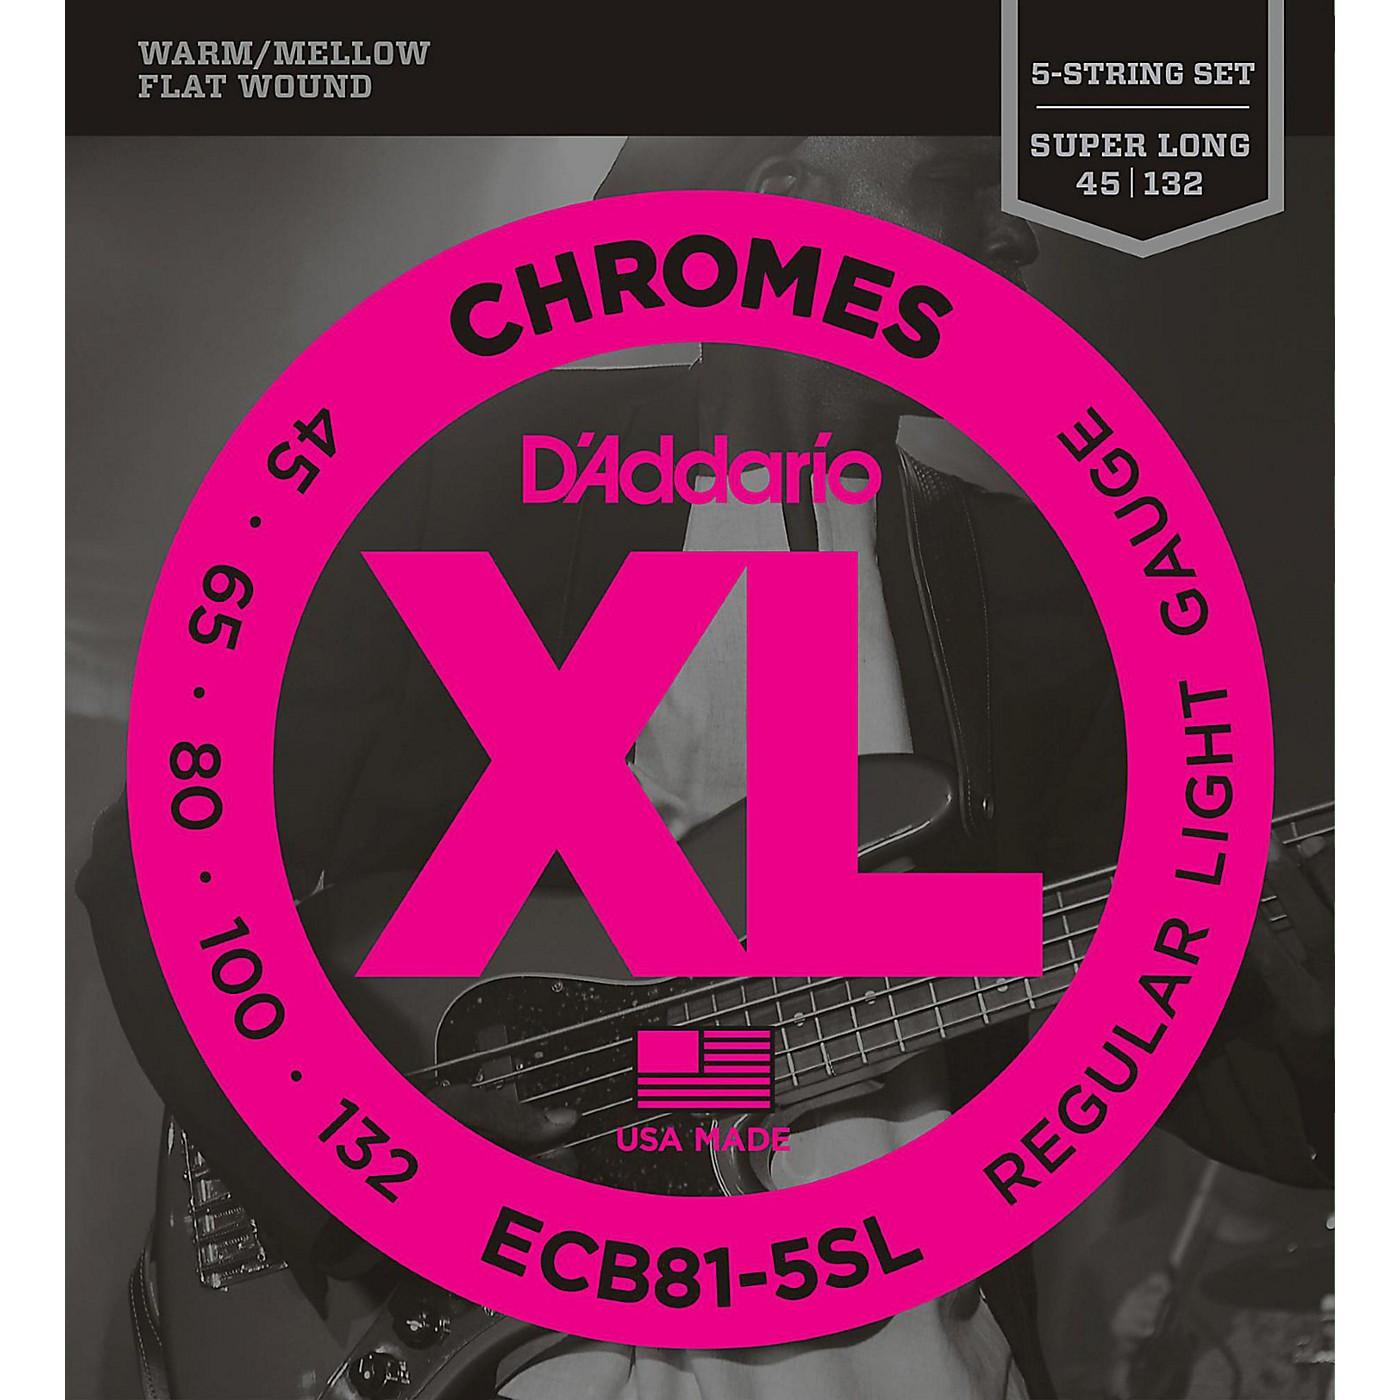 D'Addario ECB81-5SL Chromes Flat Wound 5-String Bass Soft SL Strings thumbnail